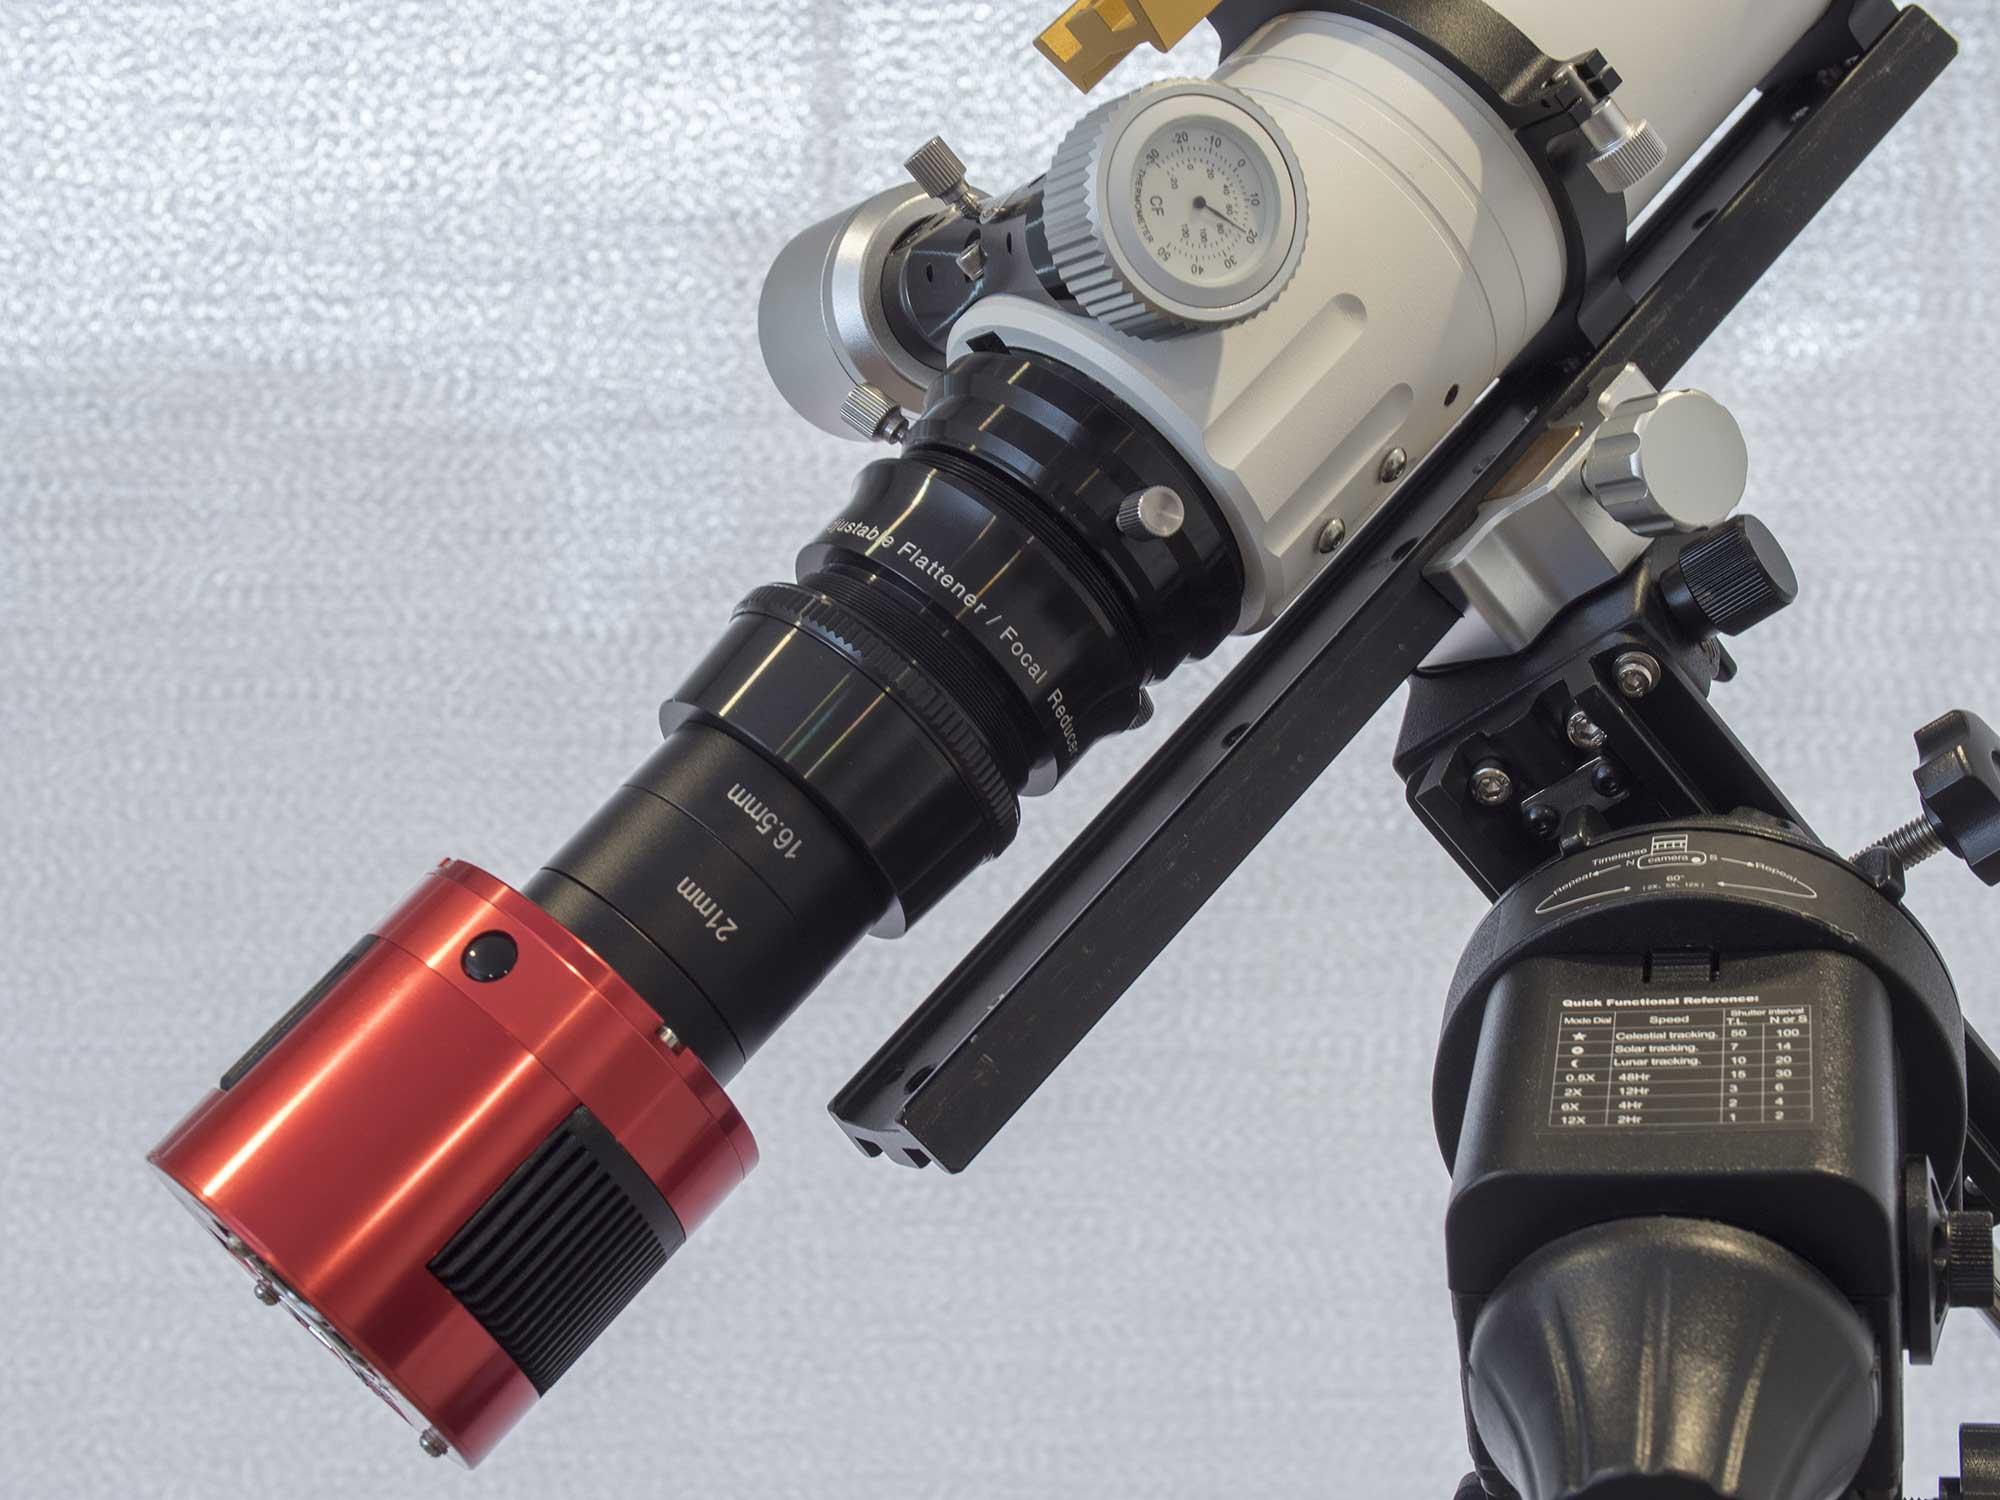 William Optics GT71 with 6A2 field flattener